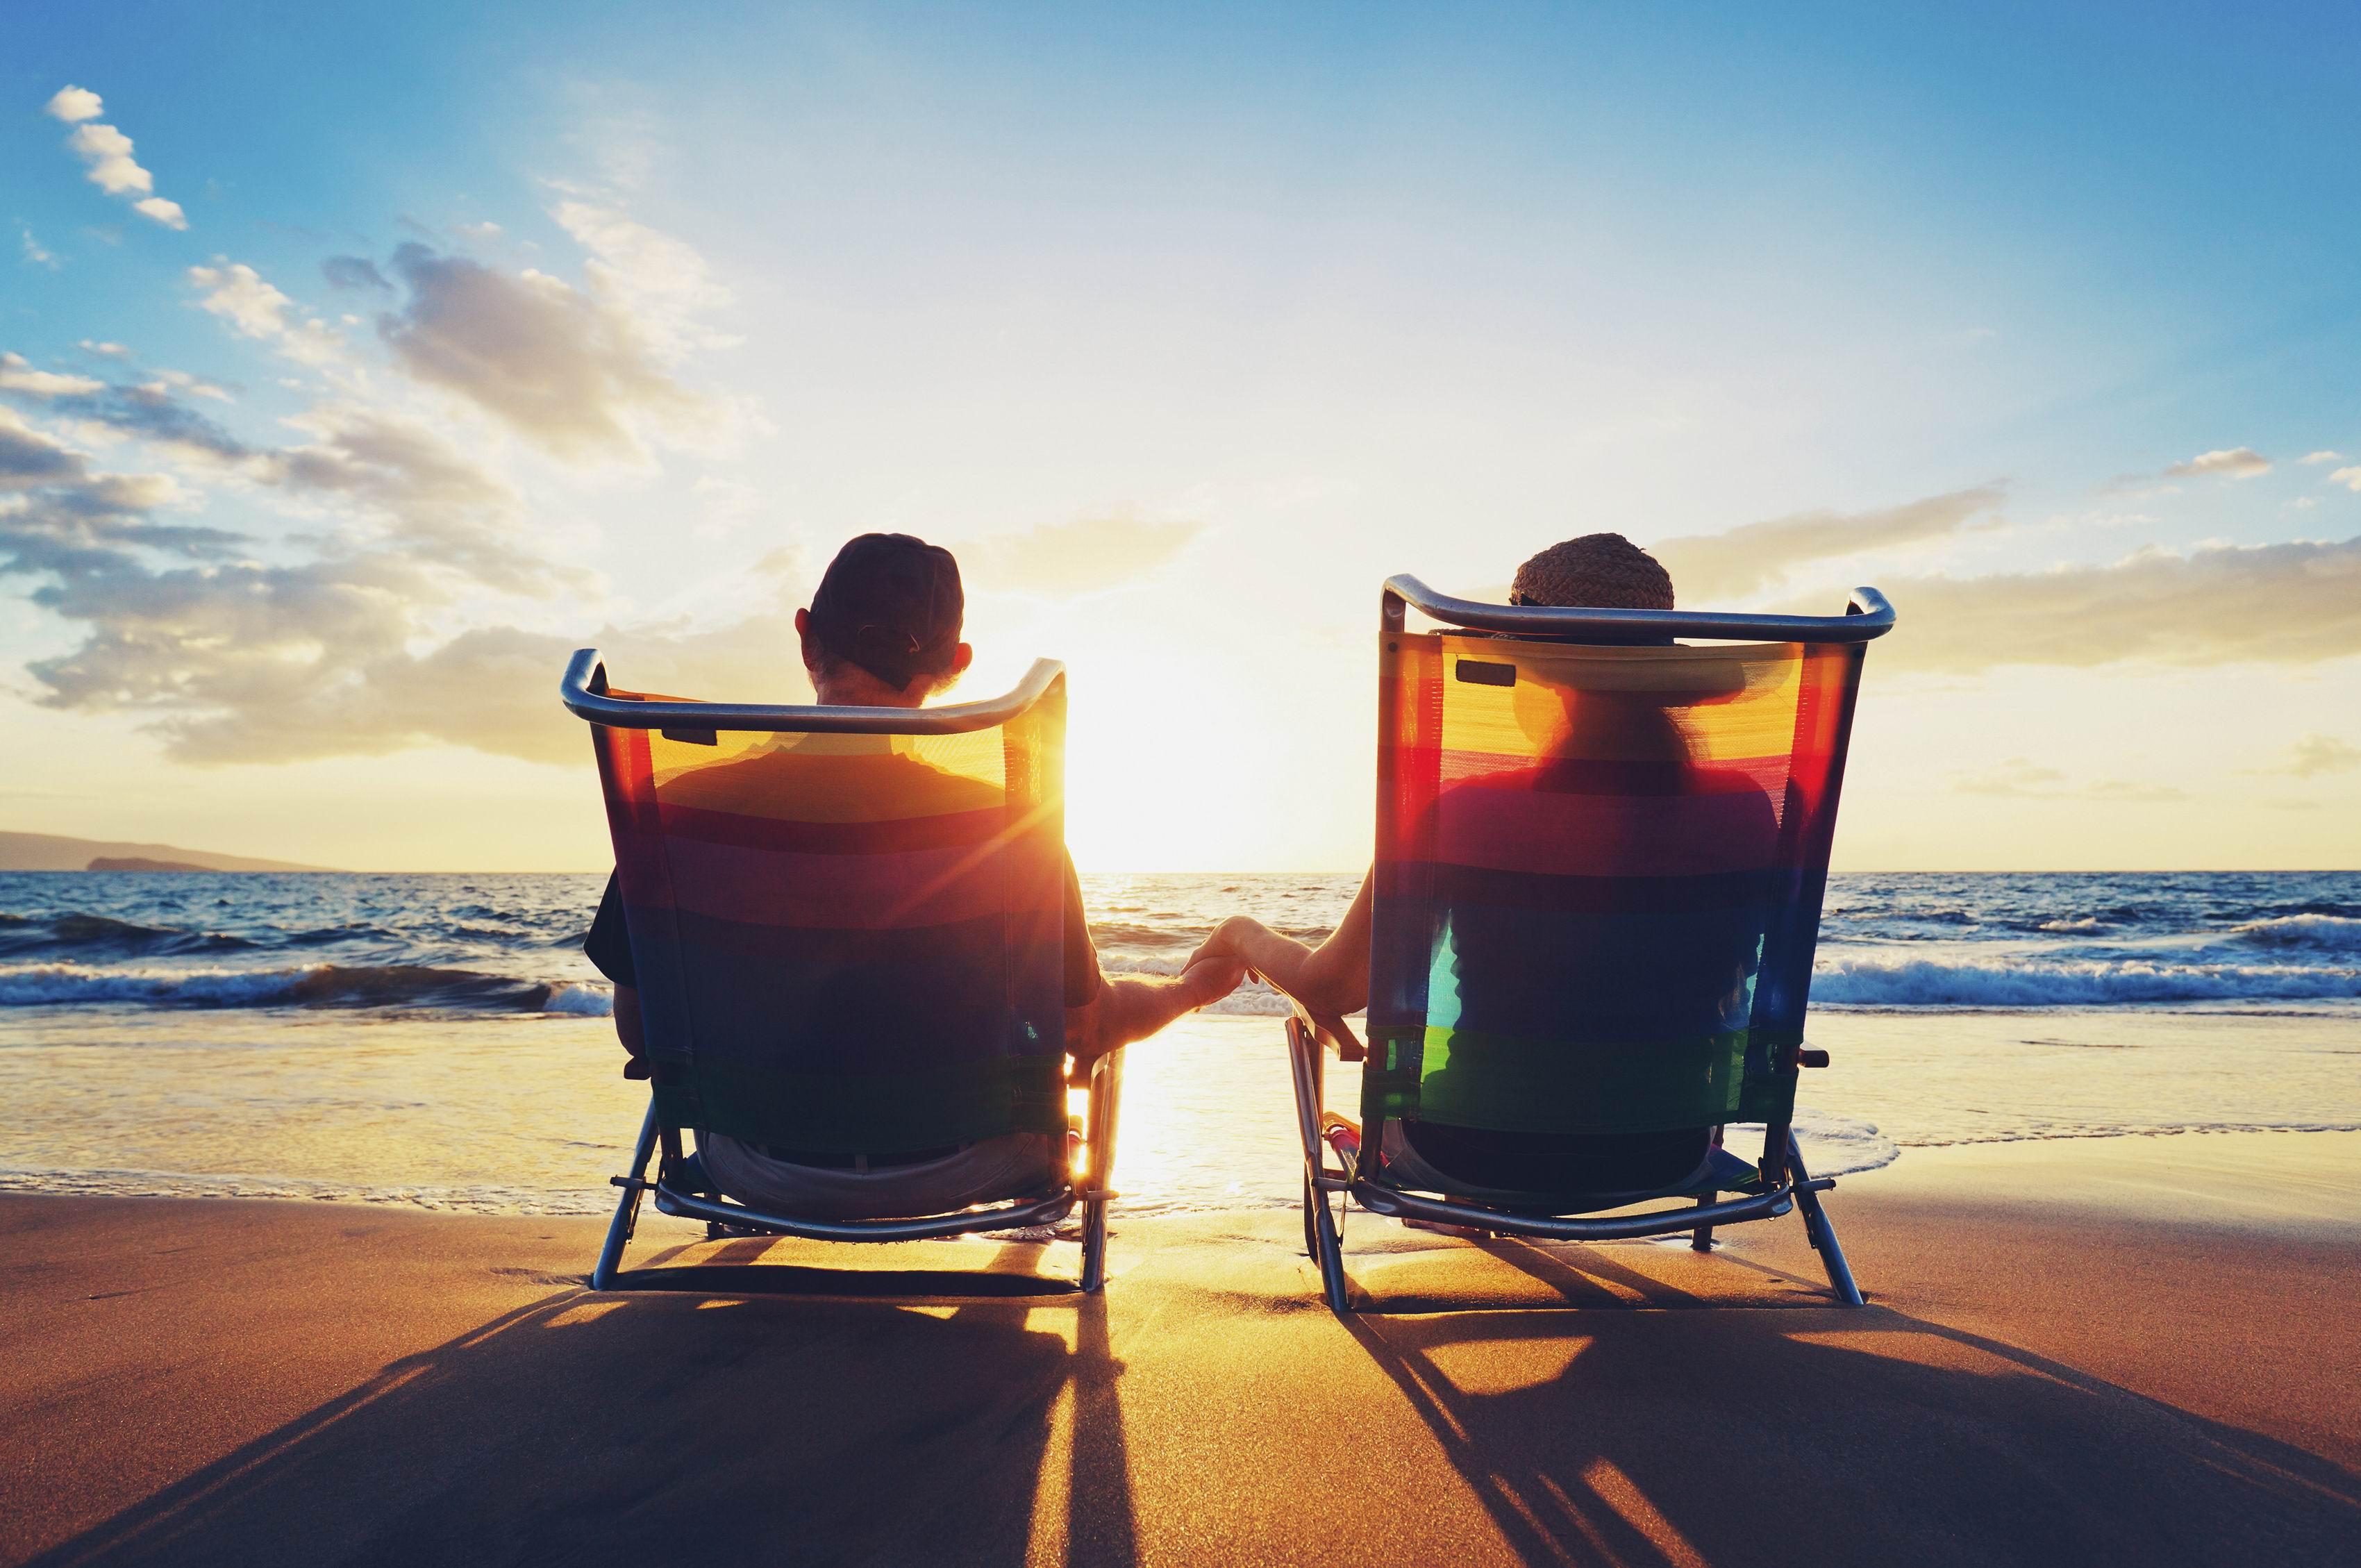 retraite-heureuse-plage